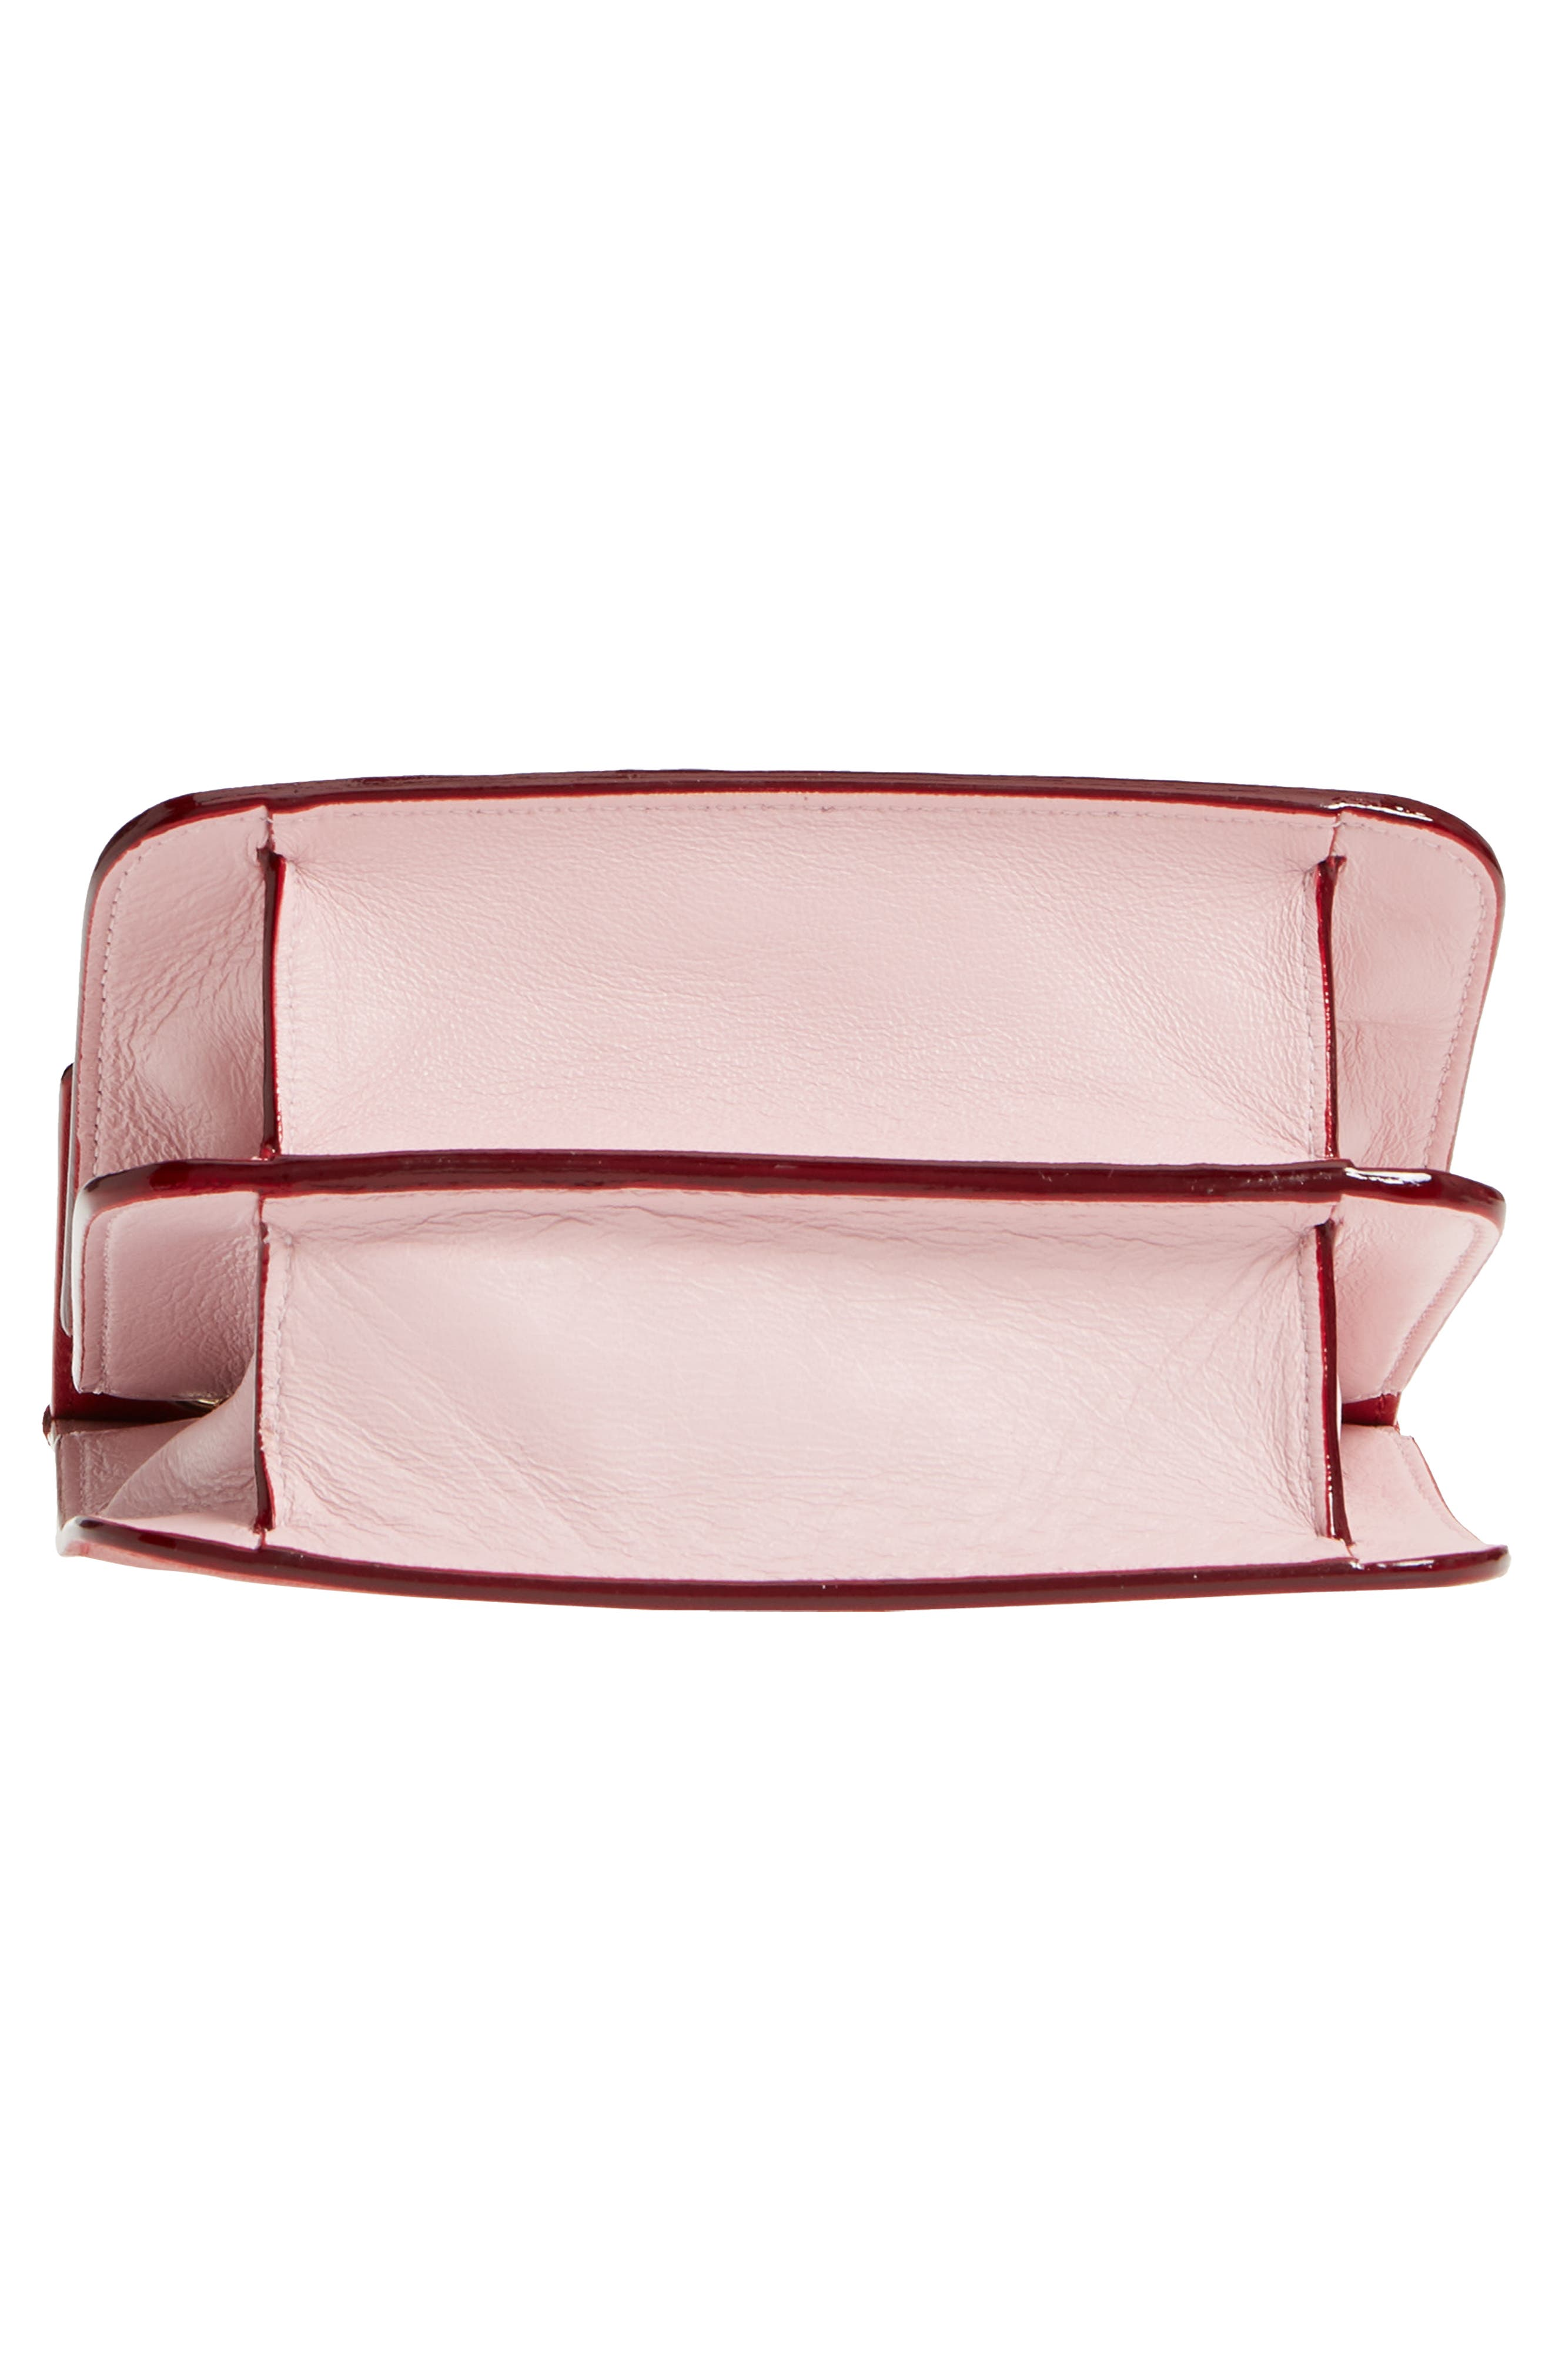 Rebel Mini Colorblock Leather Crossbody Bag,                             Alternate thumbnail 6, color,                             Red/ Rosewater